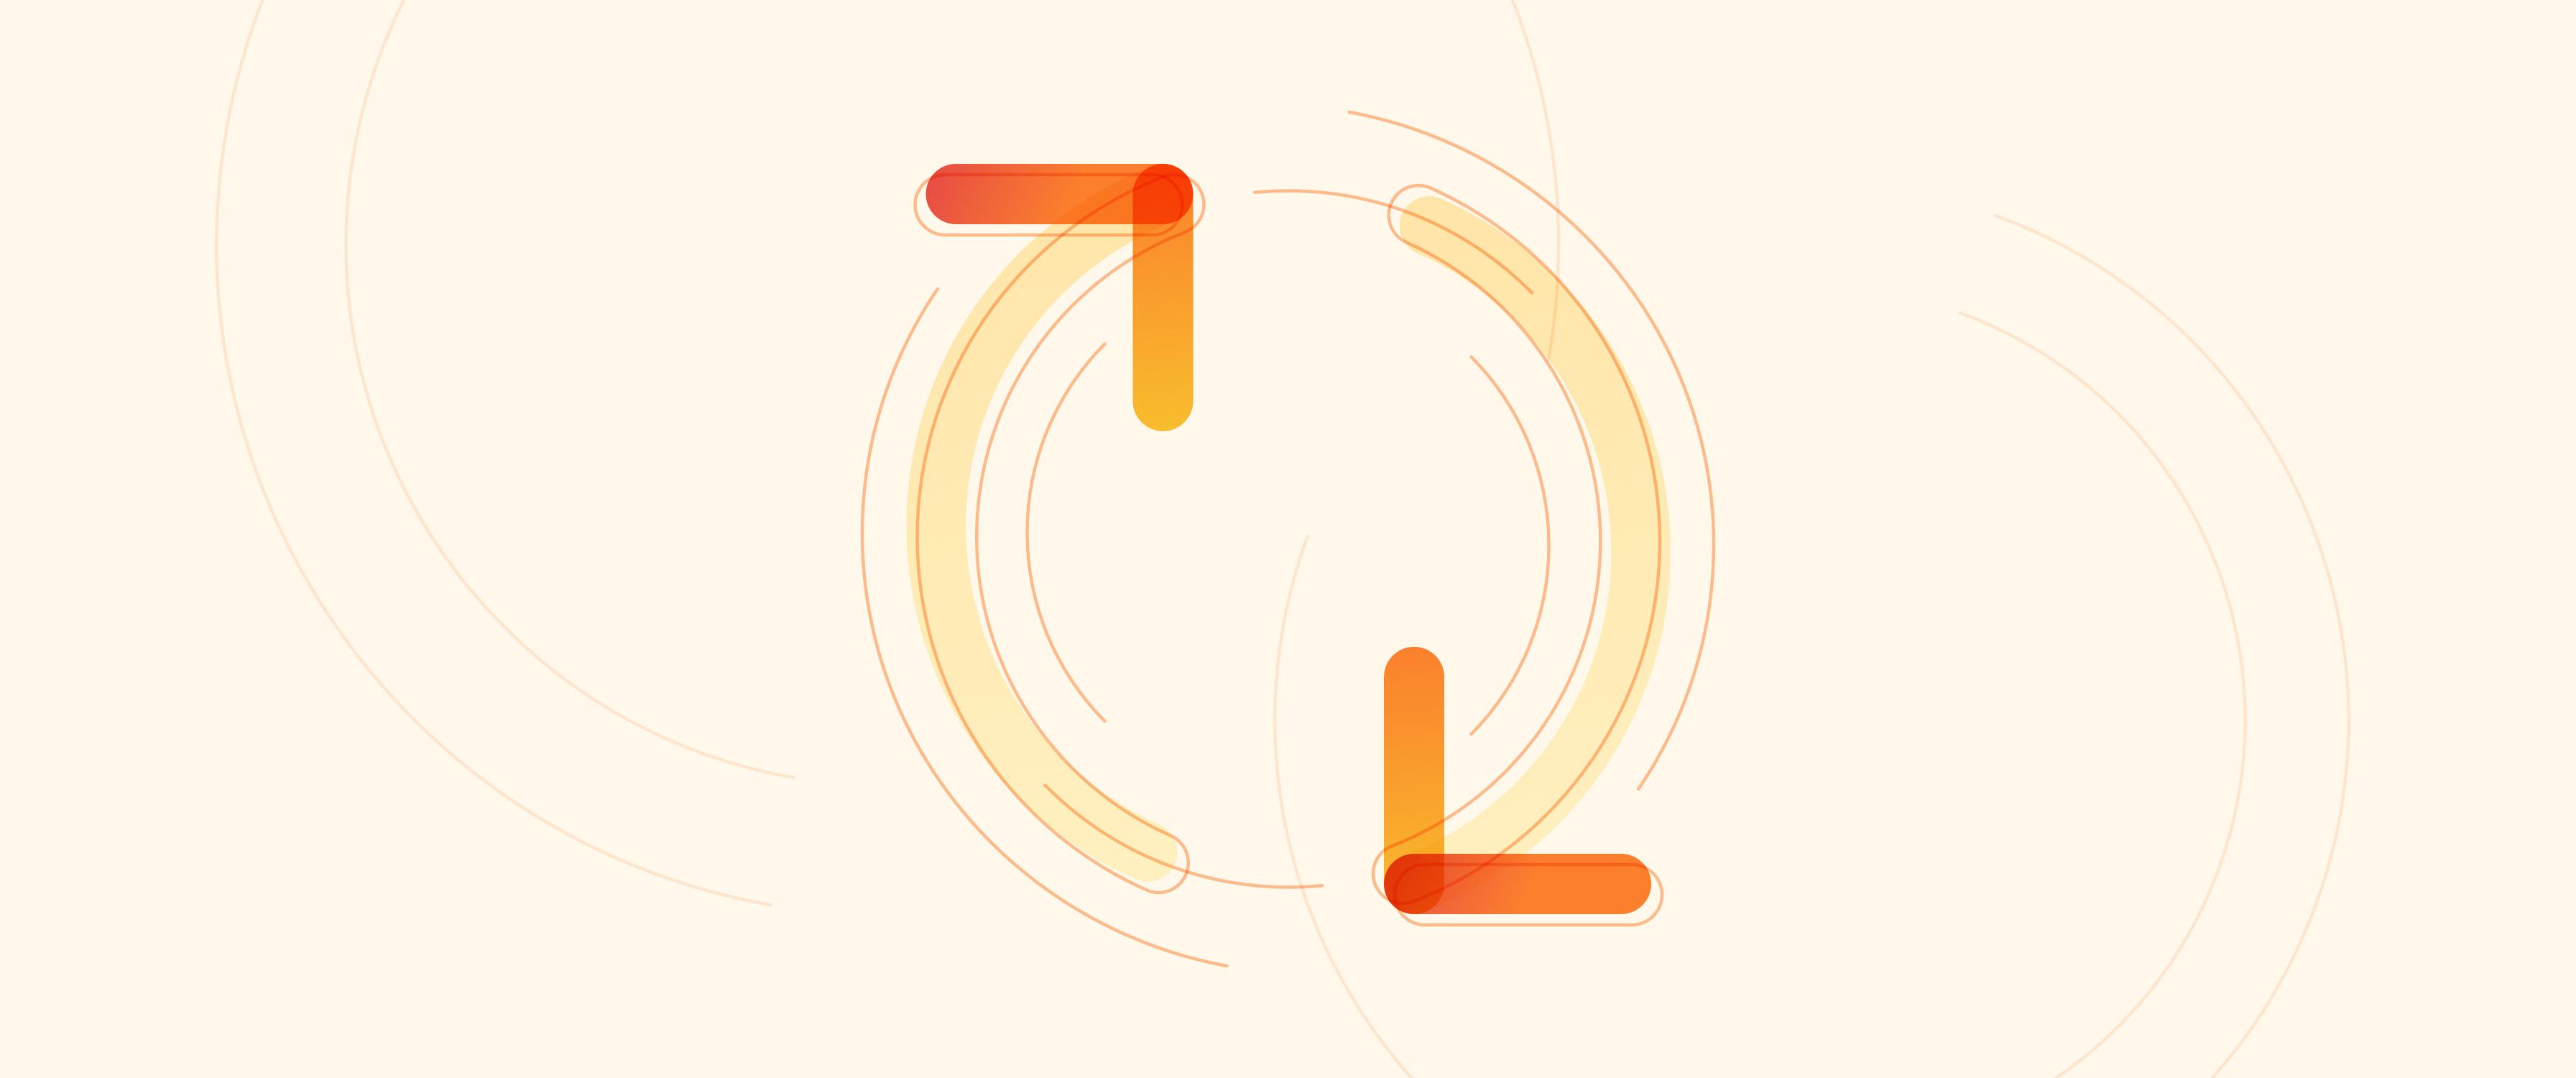 Main illustrated image for Speeding up Symbols blog post